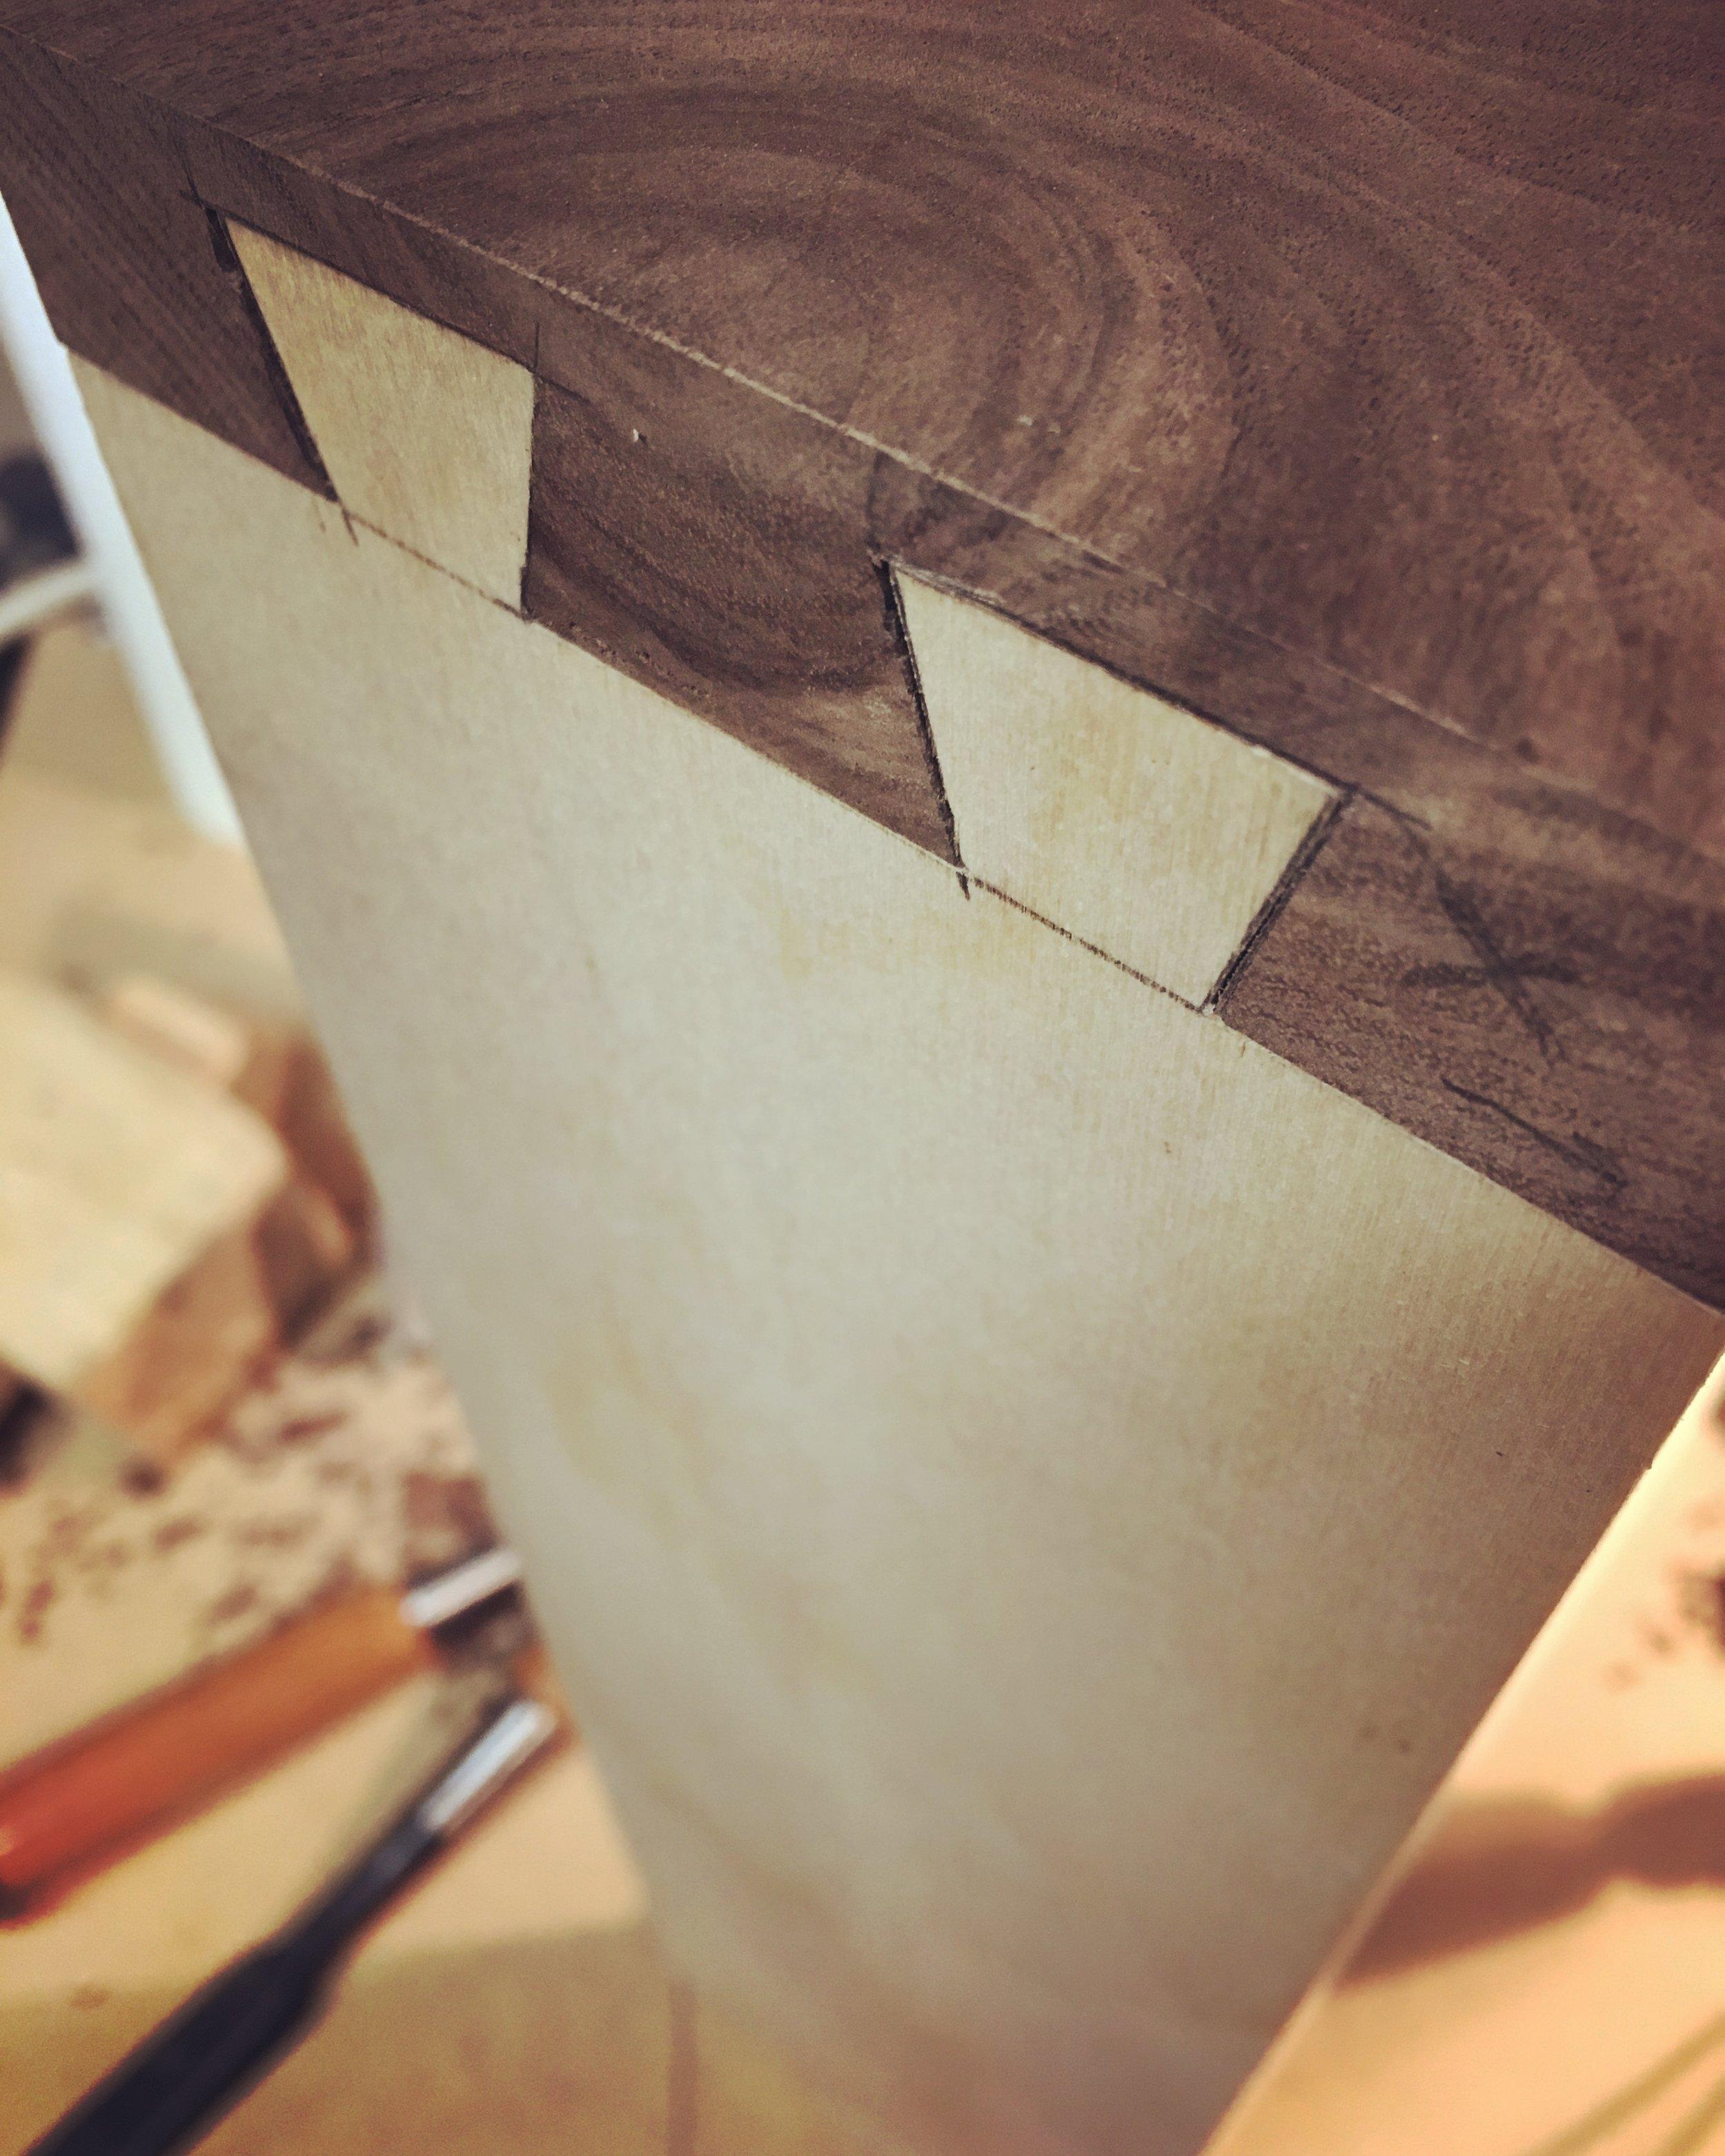 Work in progress - fitting the hidden dovetails